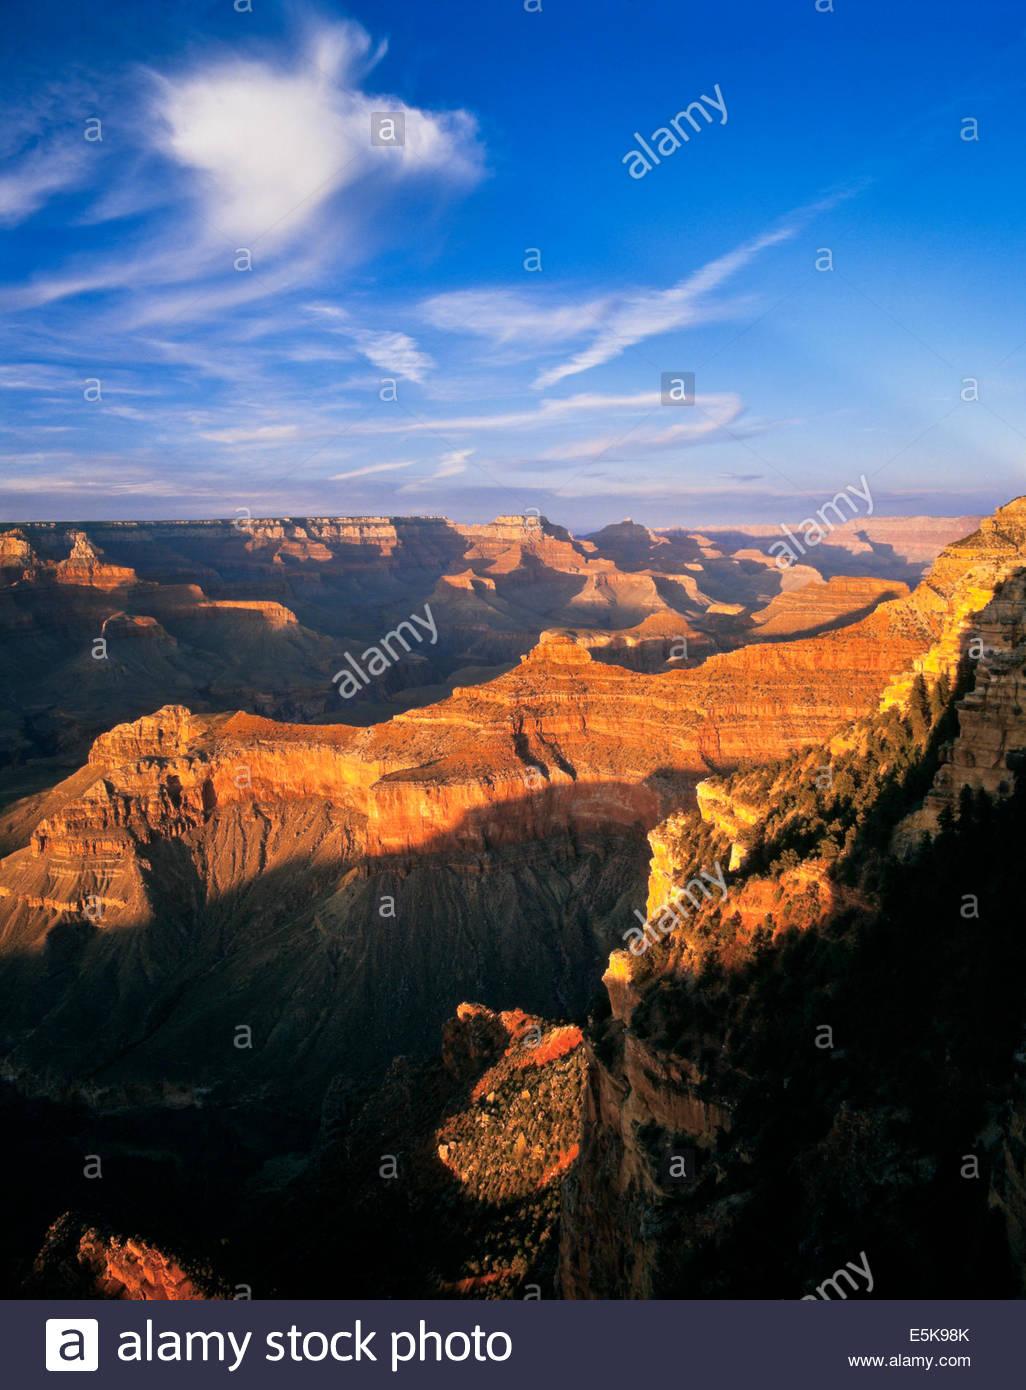 Grand Canyon National Park abends von Yavapai Point am Südrand in Arizona USA Stockbild